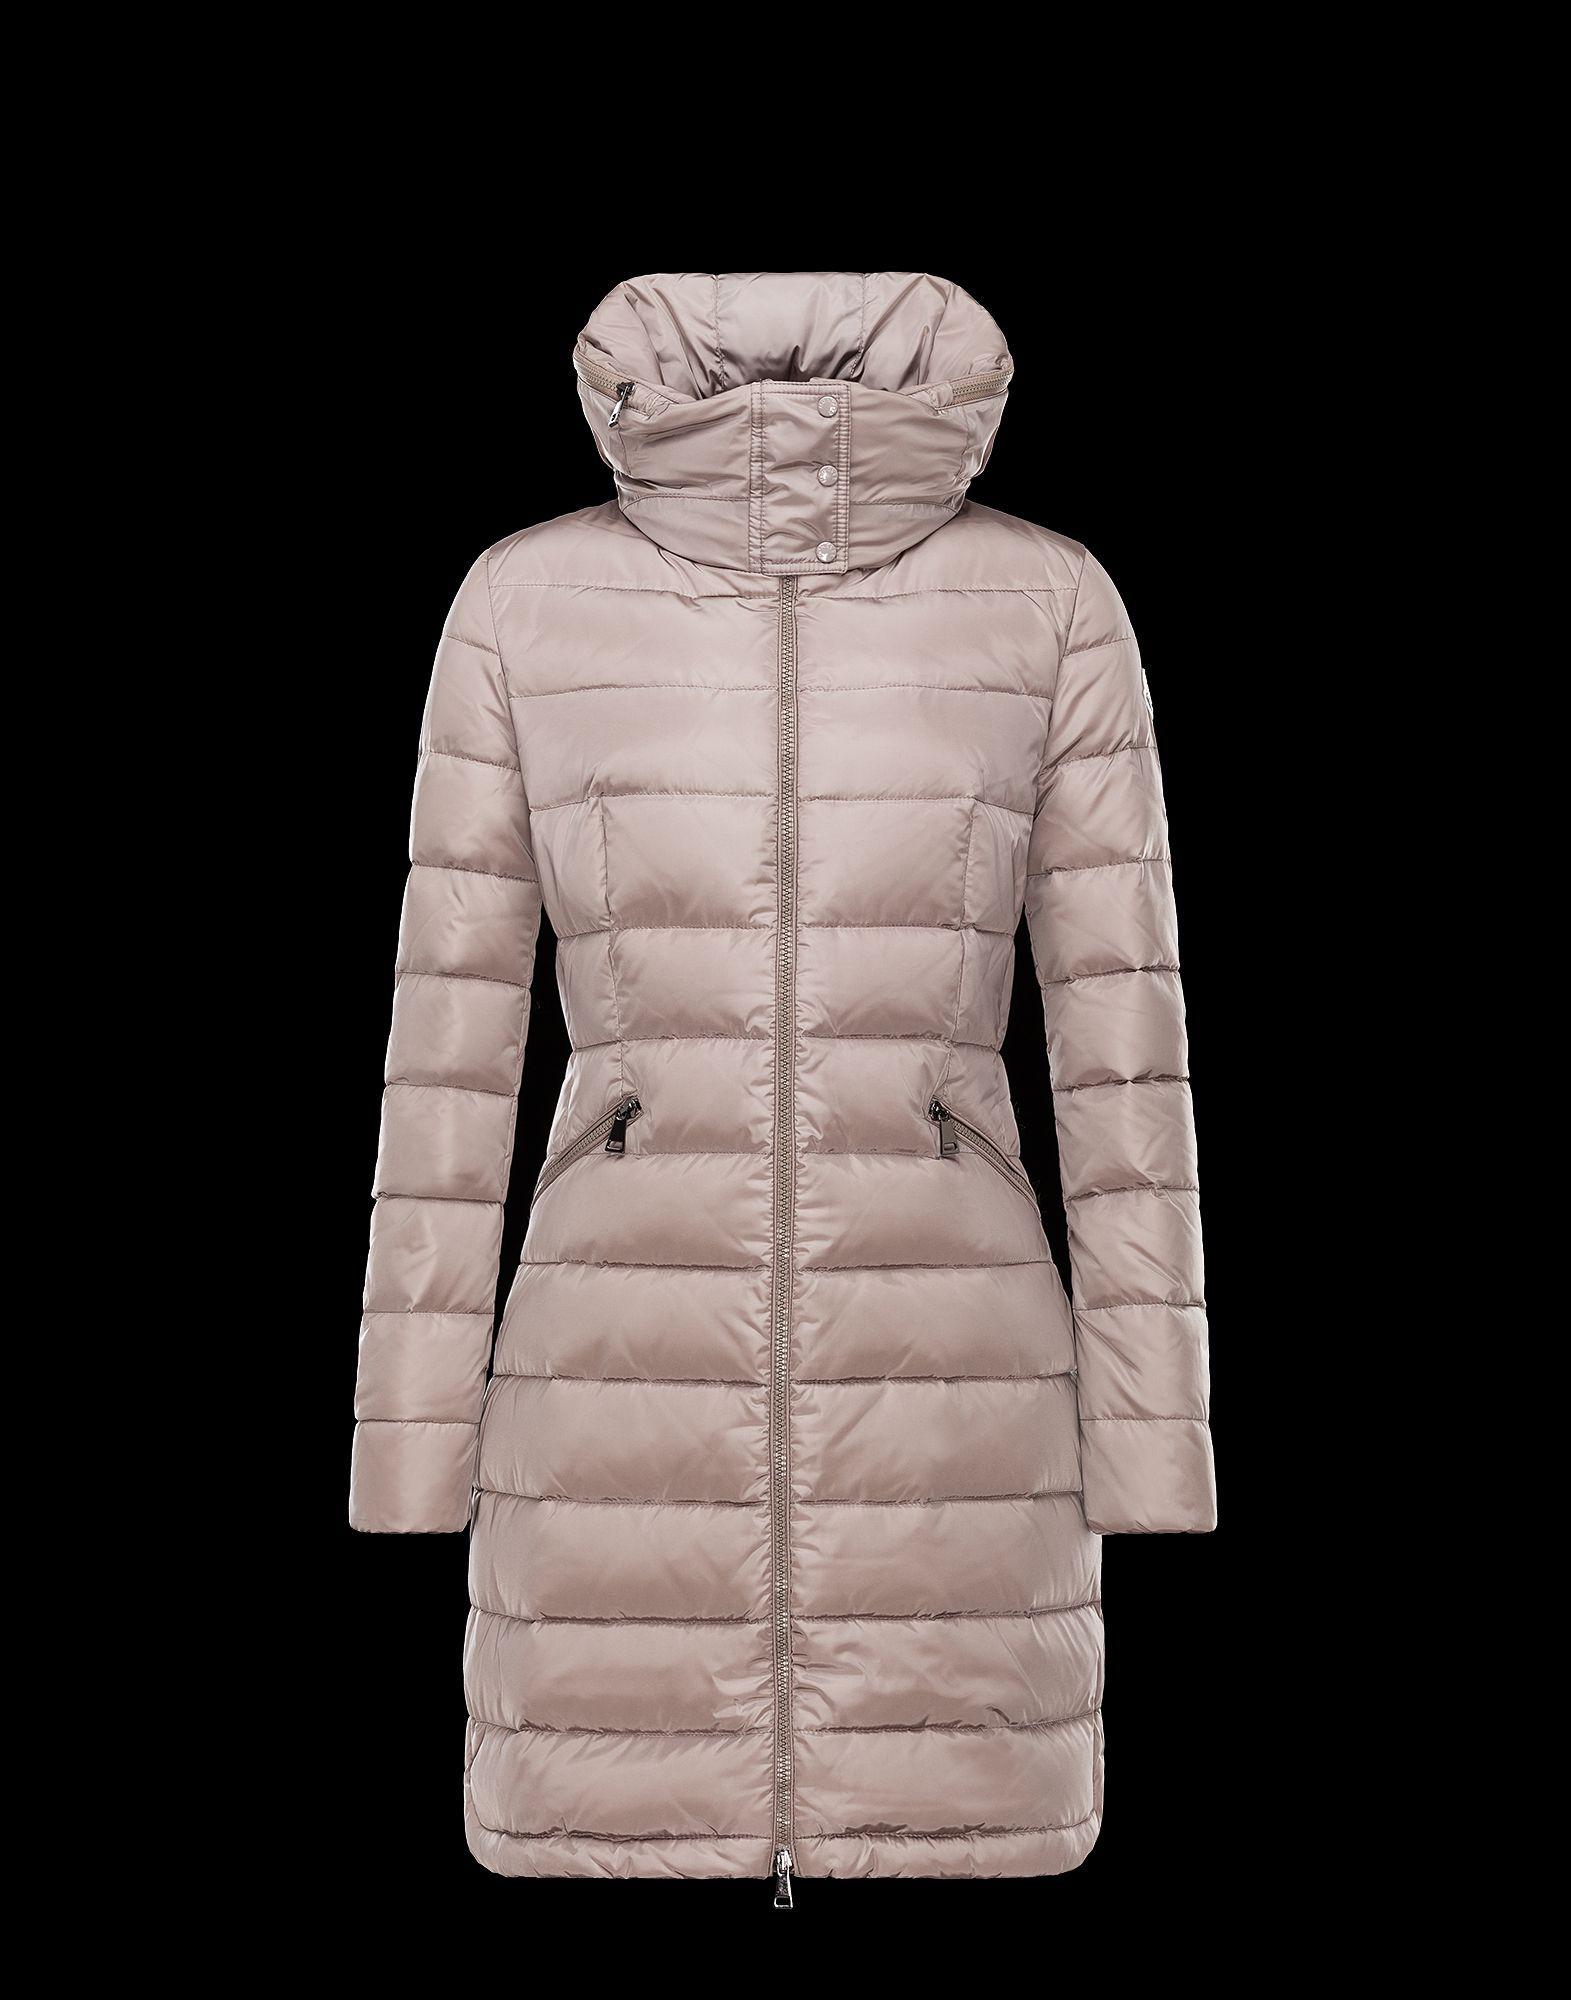 uk availability 5cff4 c00ba Moncler Online Store - Coat Women | 16FW ULD | Moncler ...